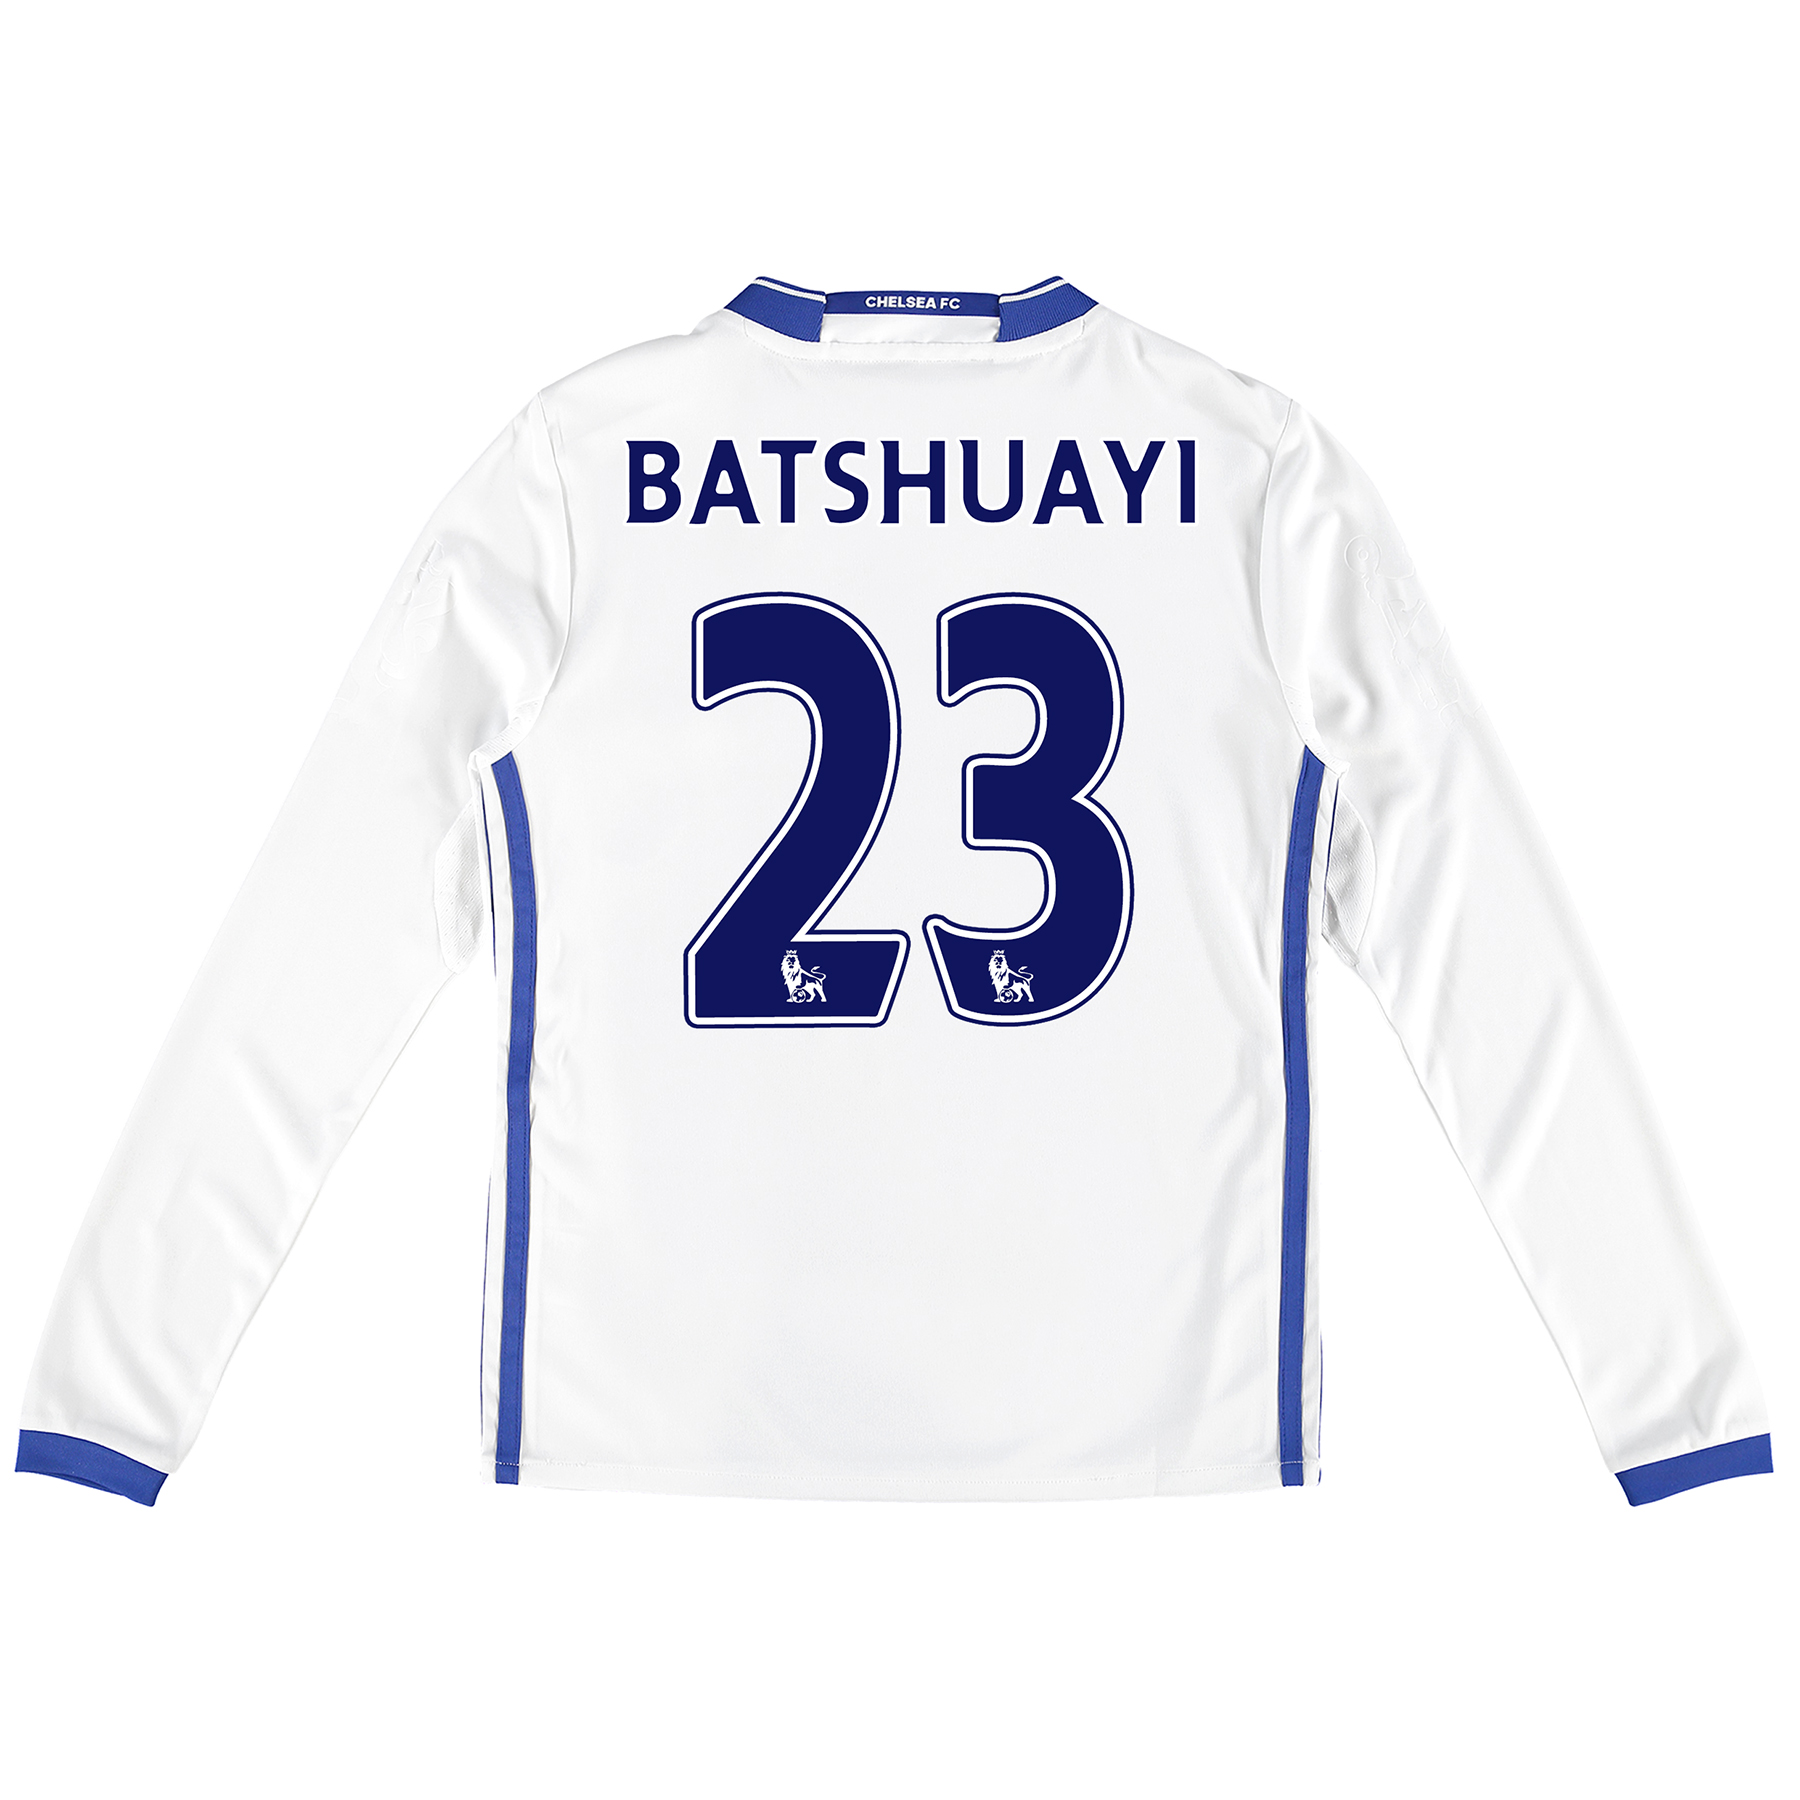 Chelsea Third Shirt 16-17 - Kids - Long Sleeve with Batshuayi 23 print